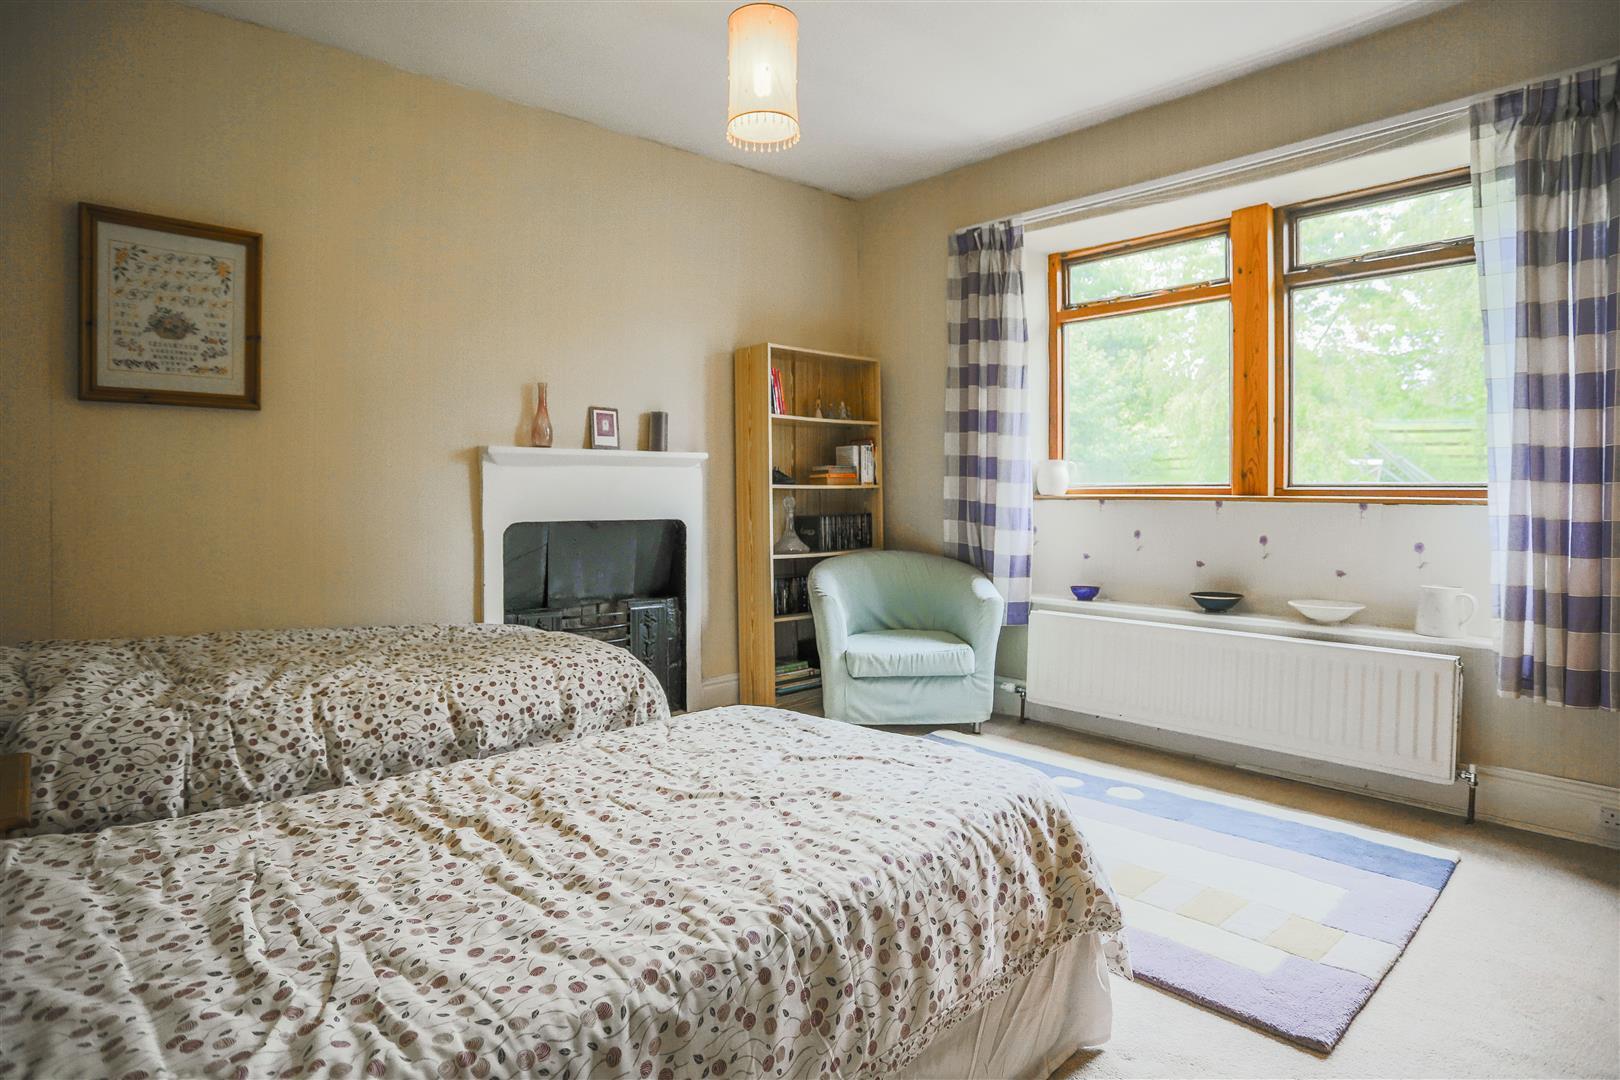 6 Bedroom Detached House For Sale - hague_58.JPG